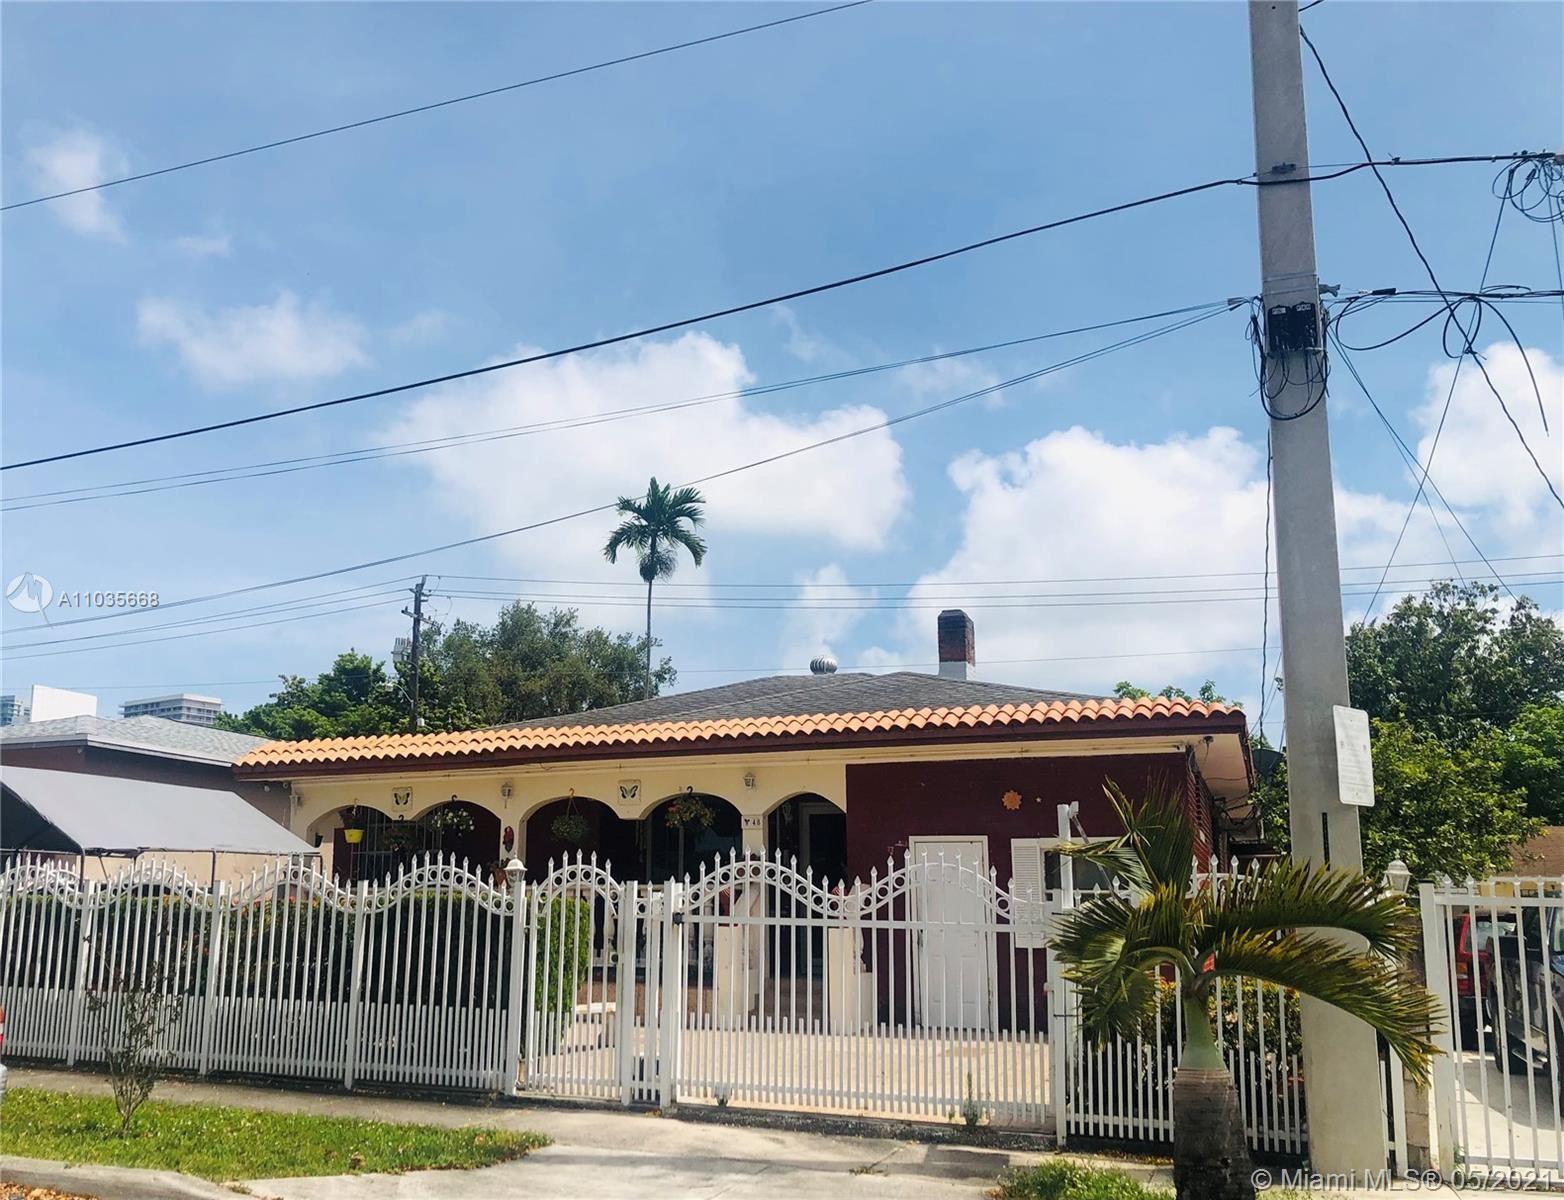 48 NW 41st St, Miami, FL 33127 - #: A11035668